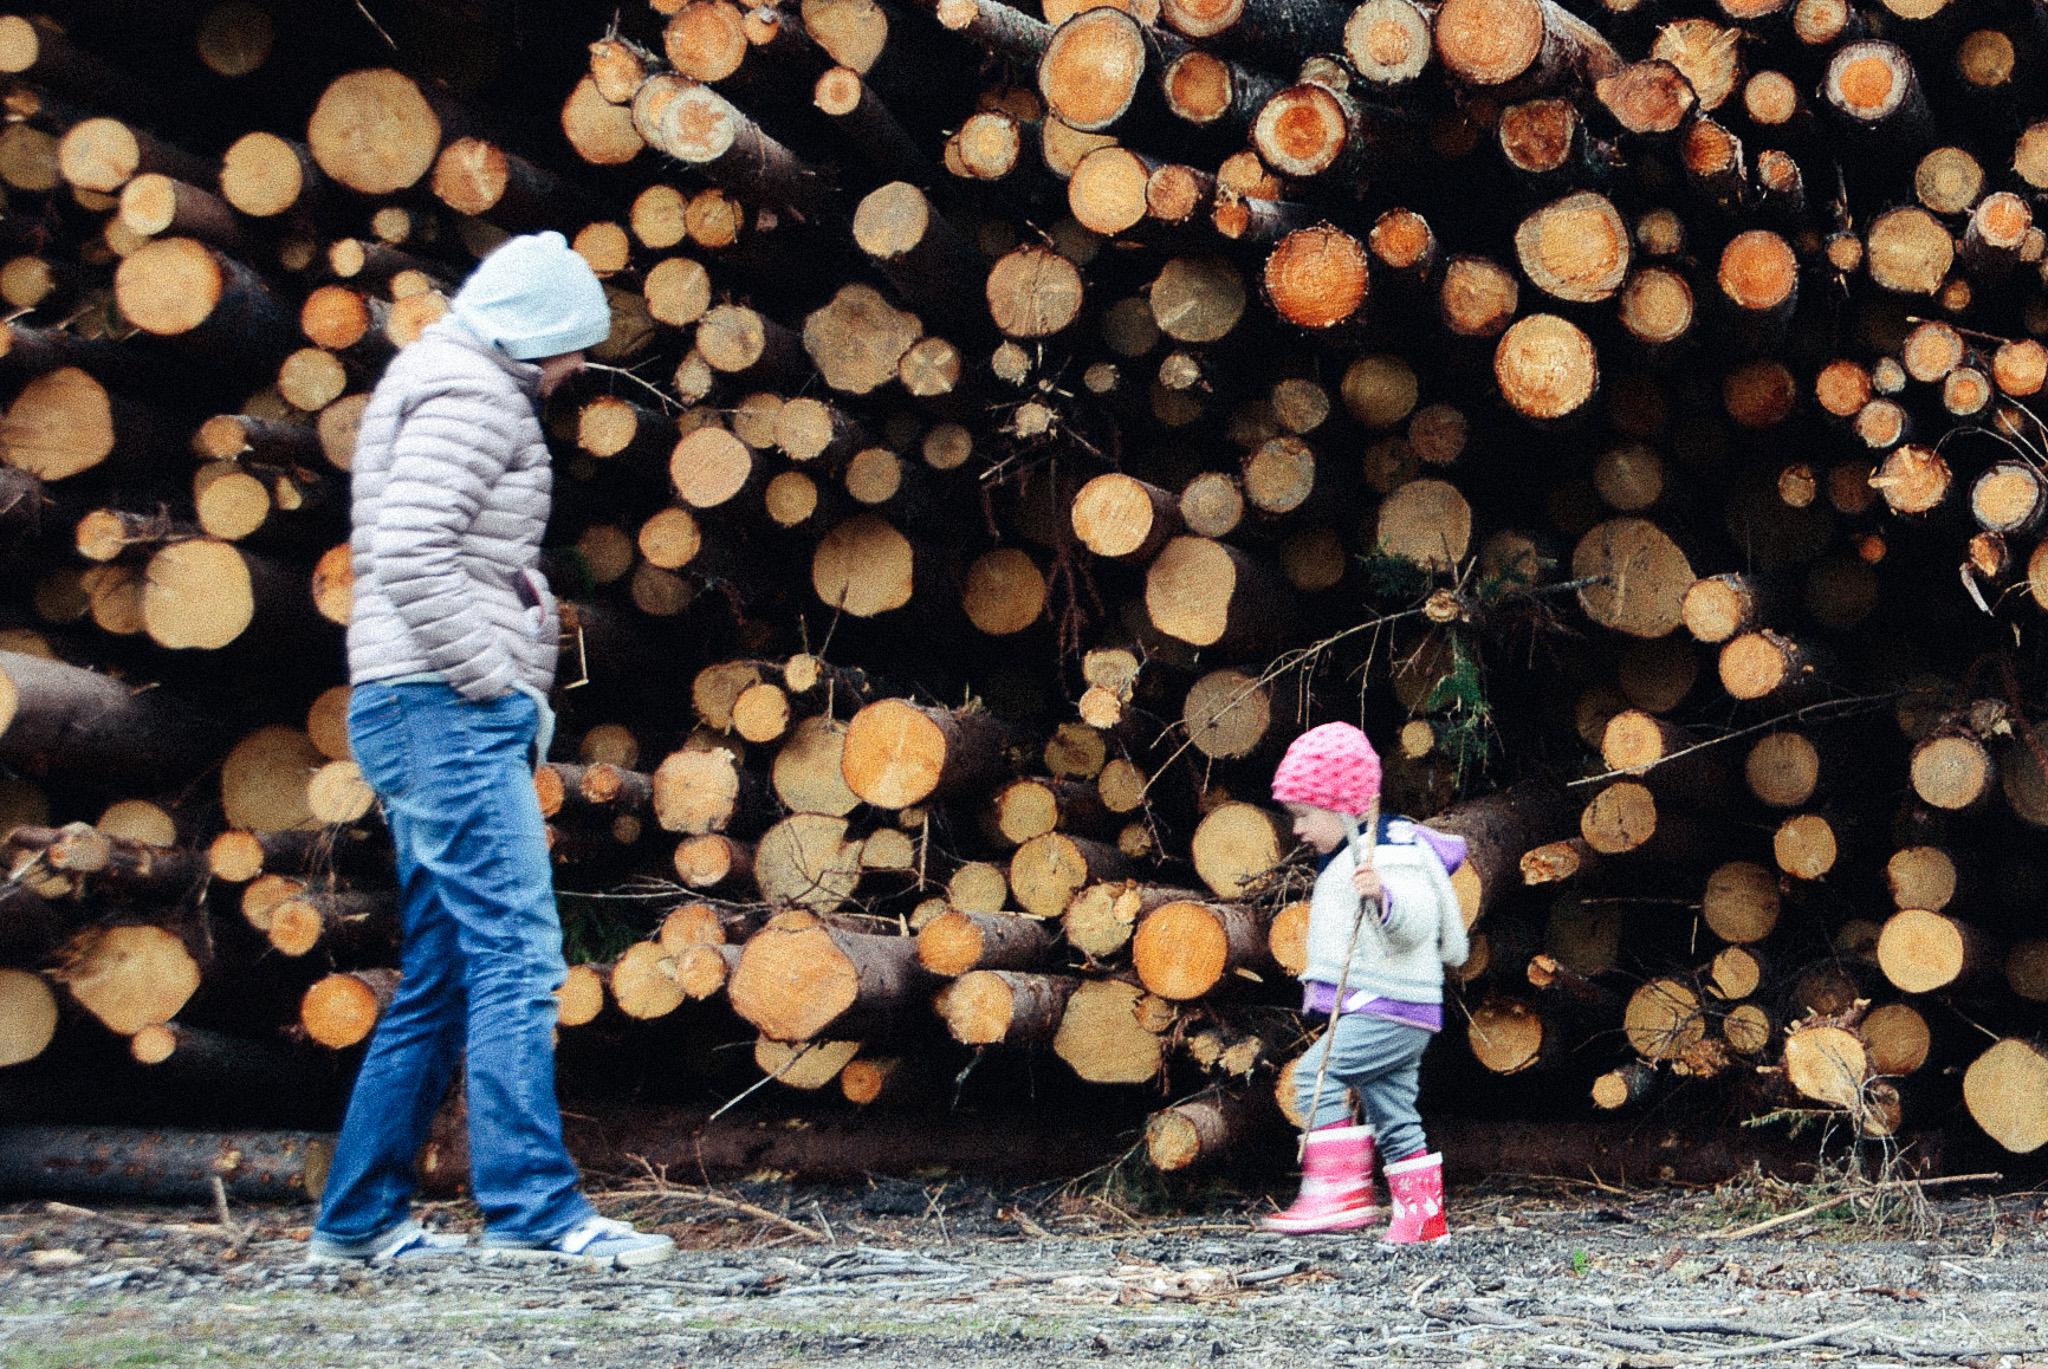 06-09-wood piles-12_LR edited_FB.jpg